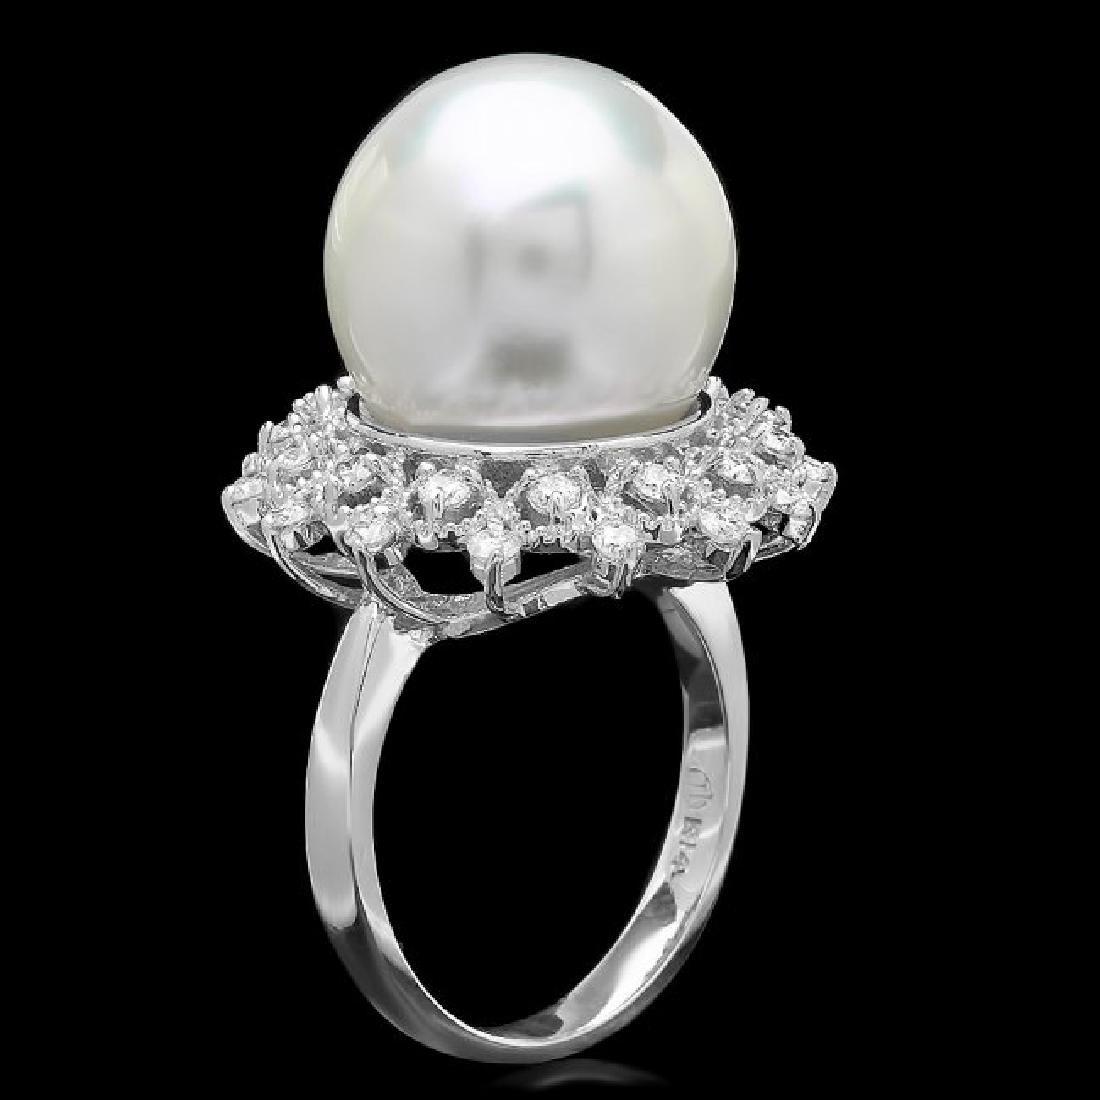 14k Gold 14 X 14mm Pearl 0.60ct Diamond Ring - 2